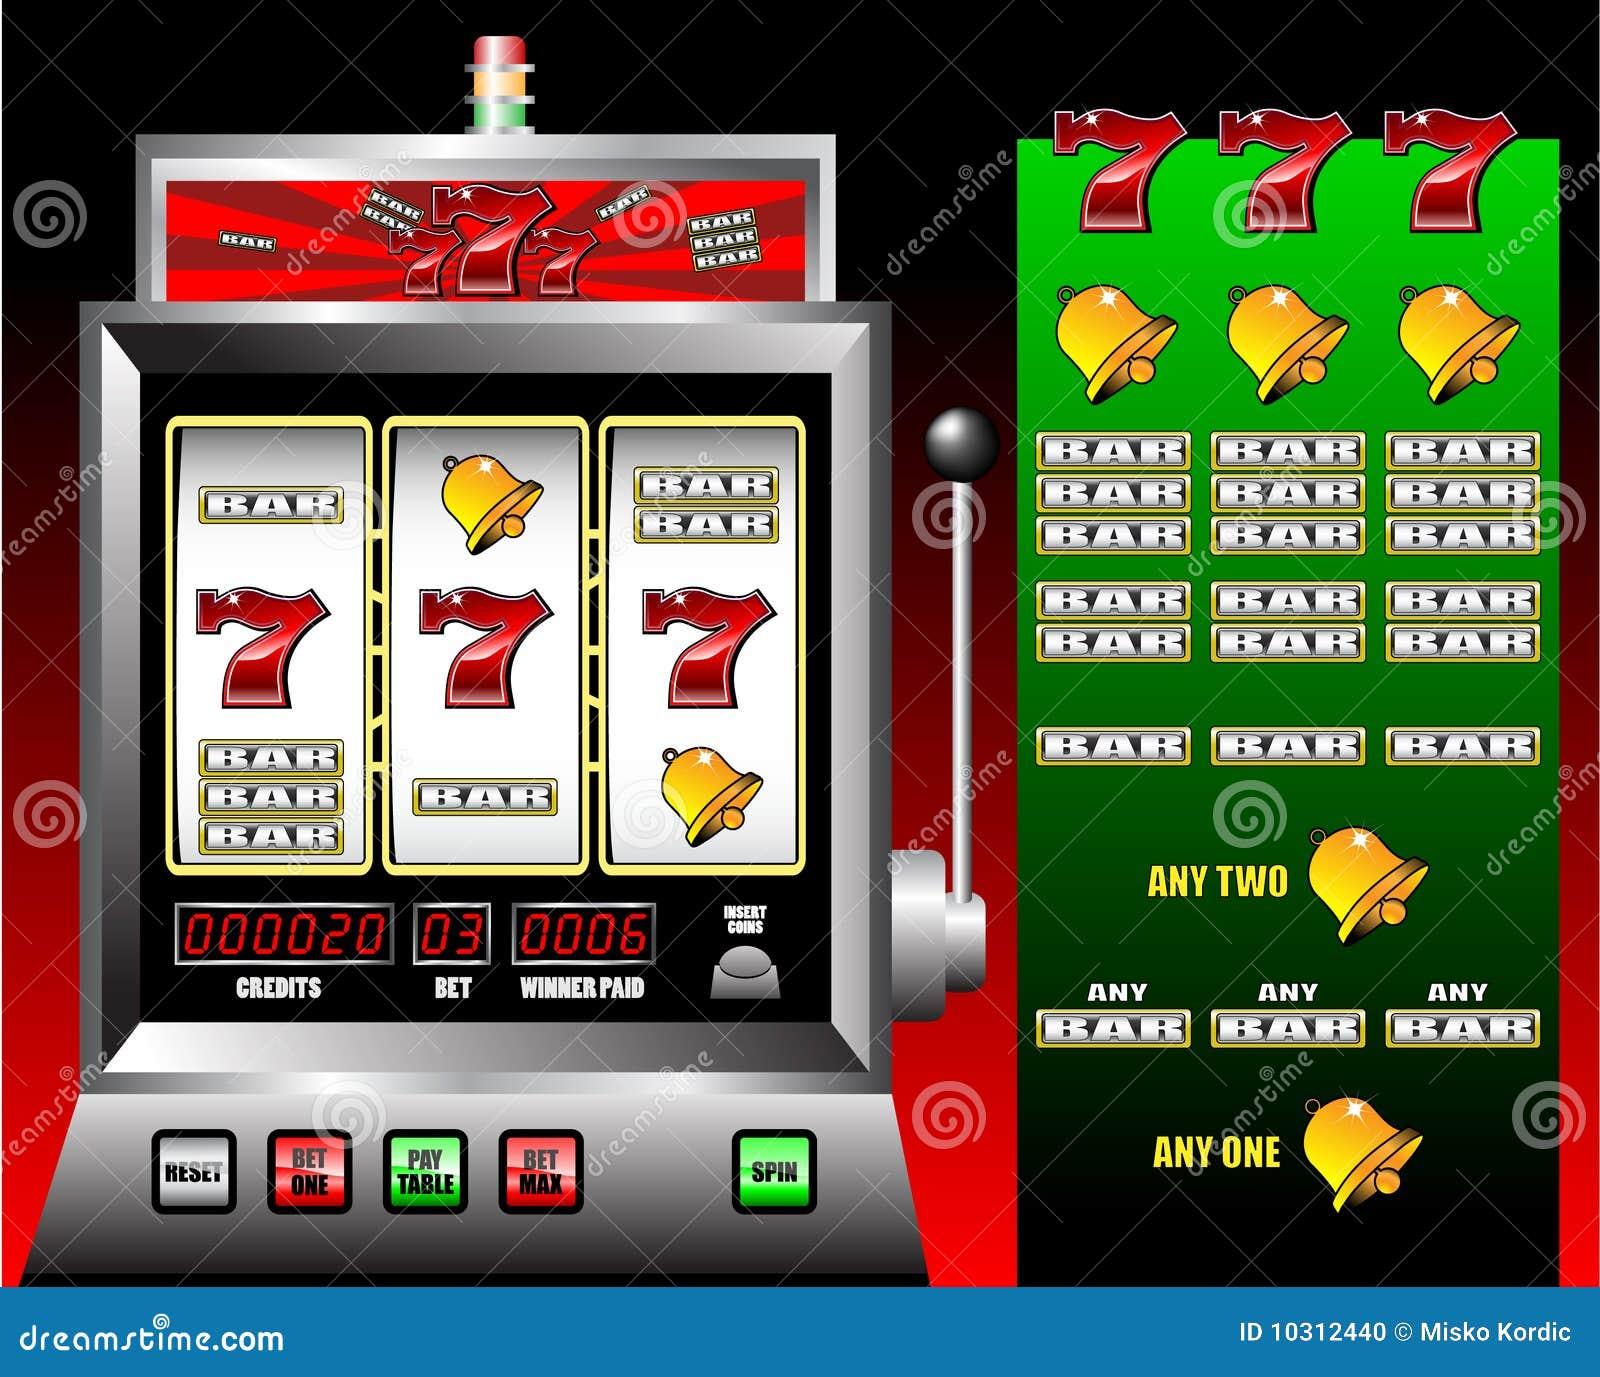 Online free slots x12